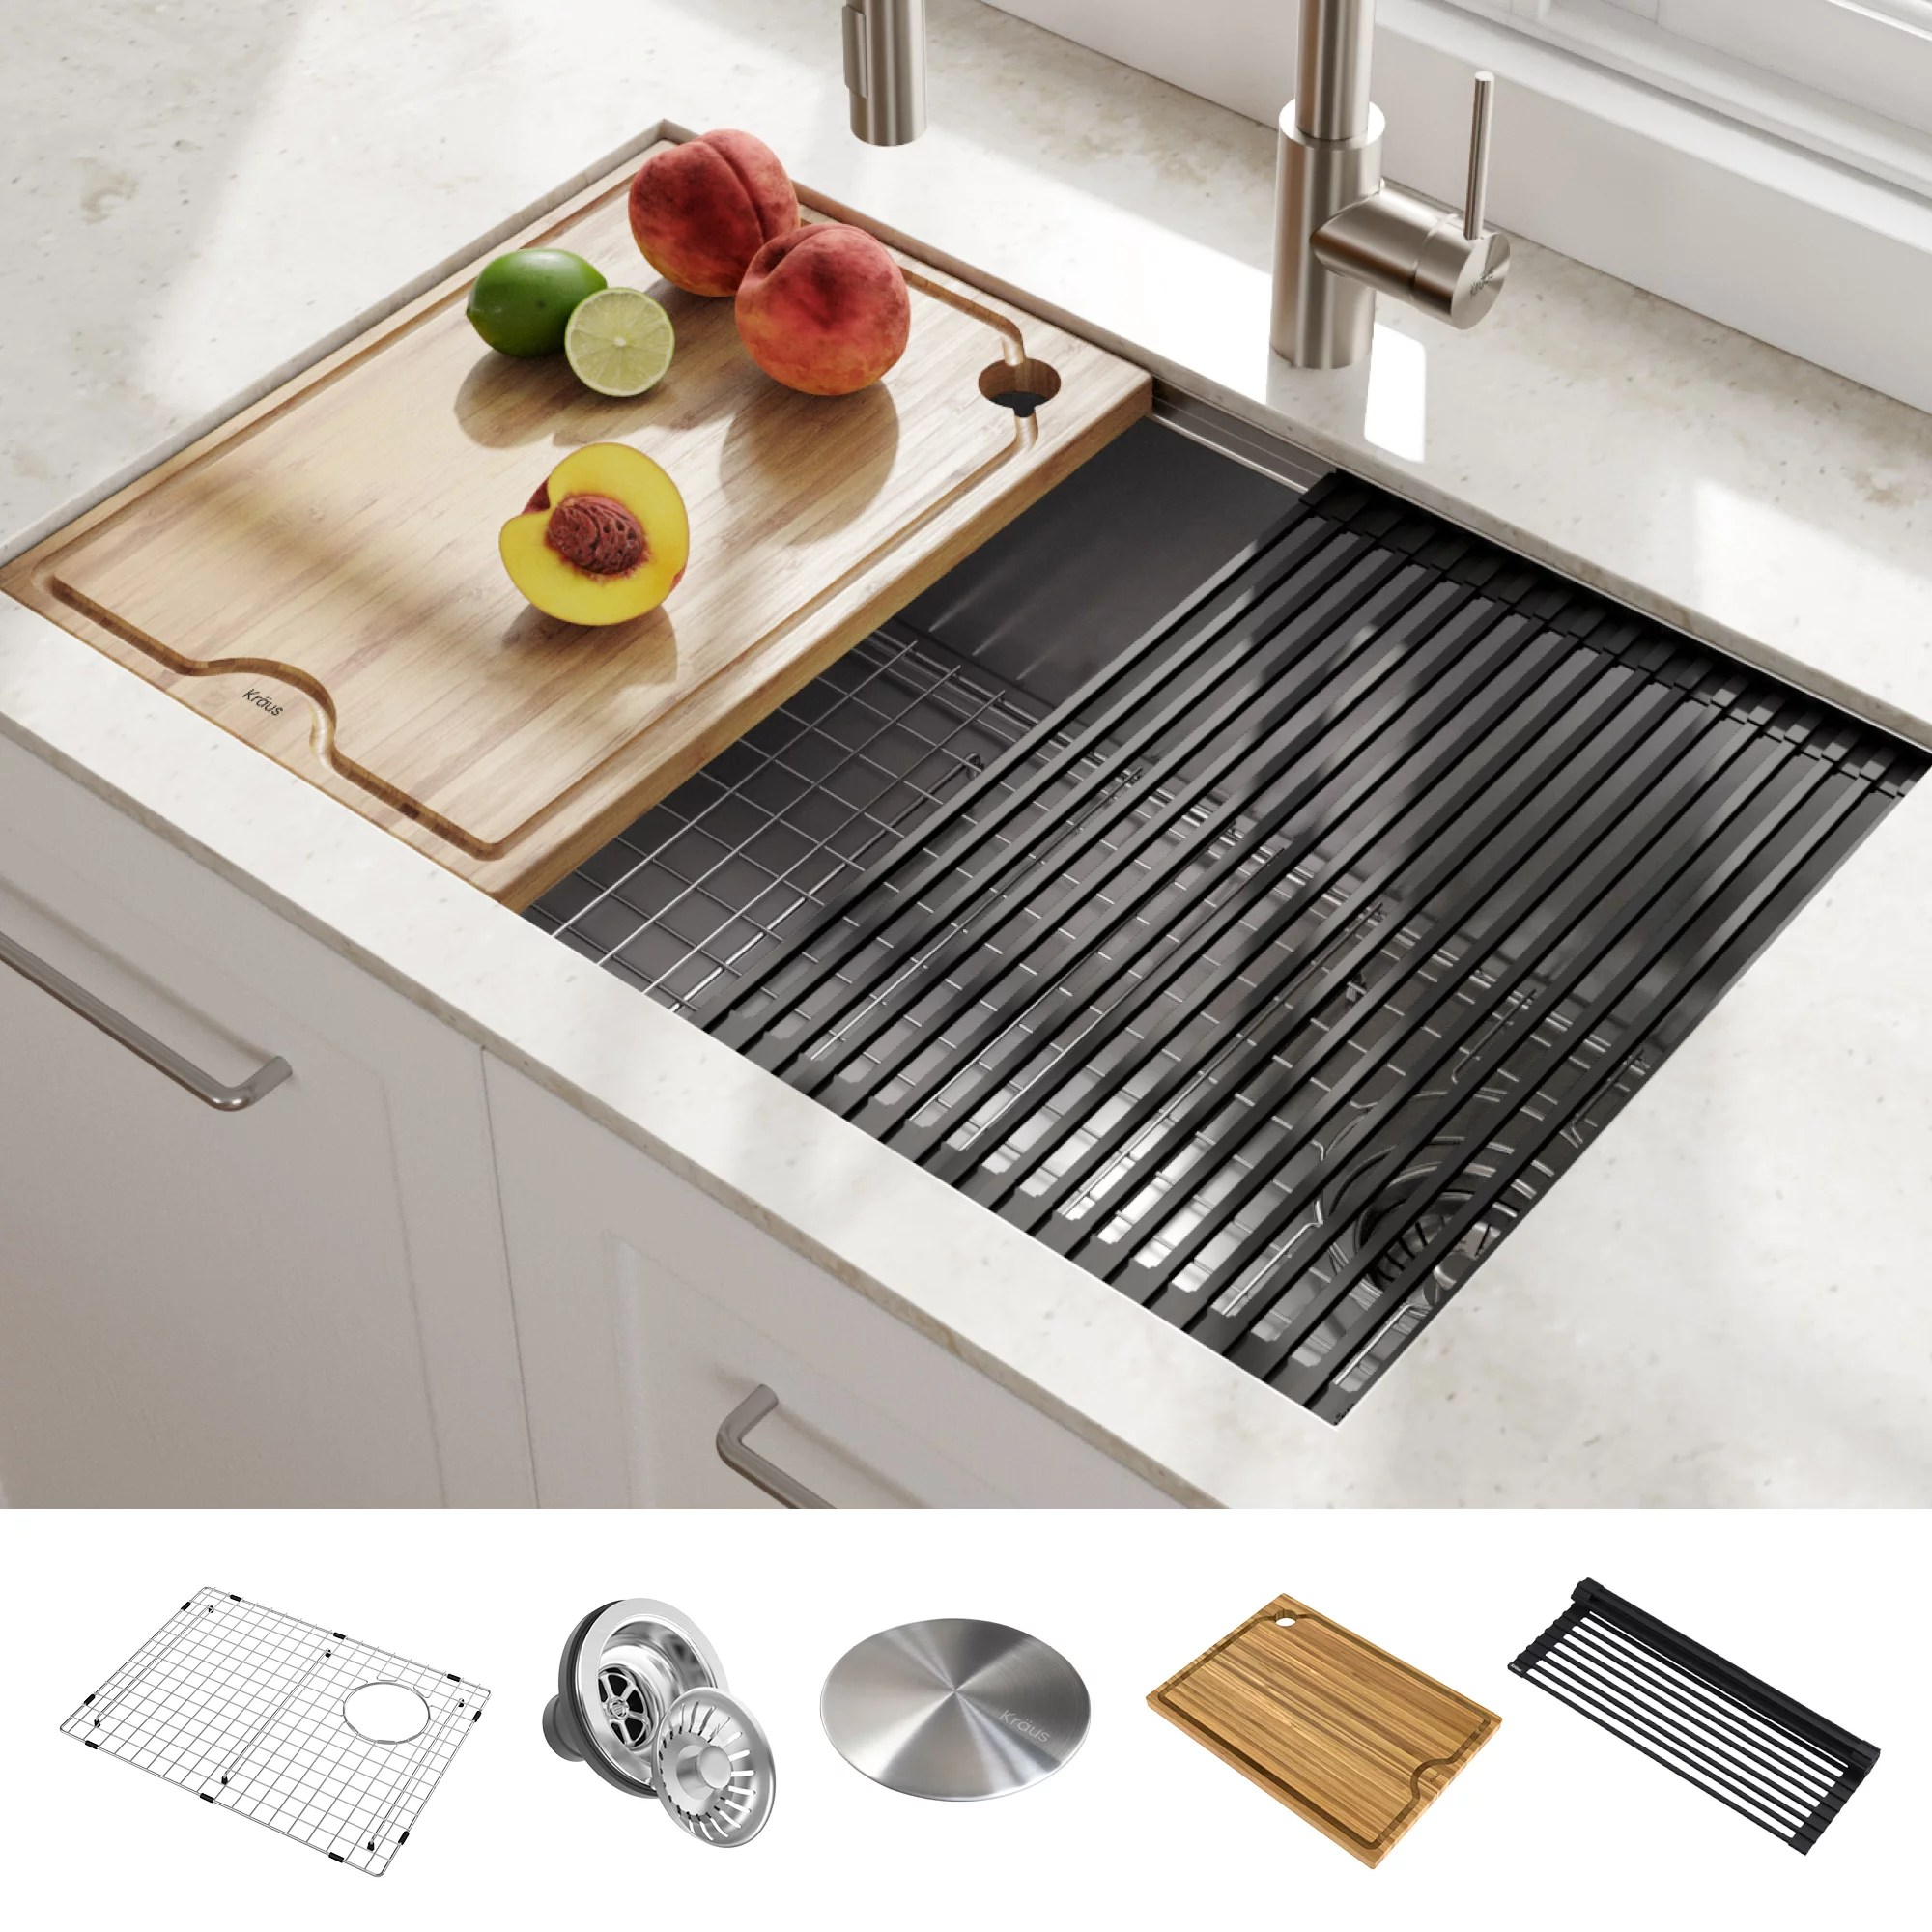 kraus kore workstation 27 inch undermount 16 gauge single bowl stainless steel kitchen sink with accessories pack of 5 walmart com